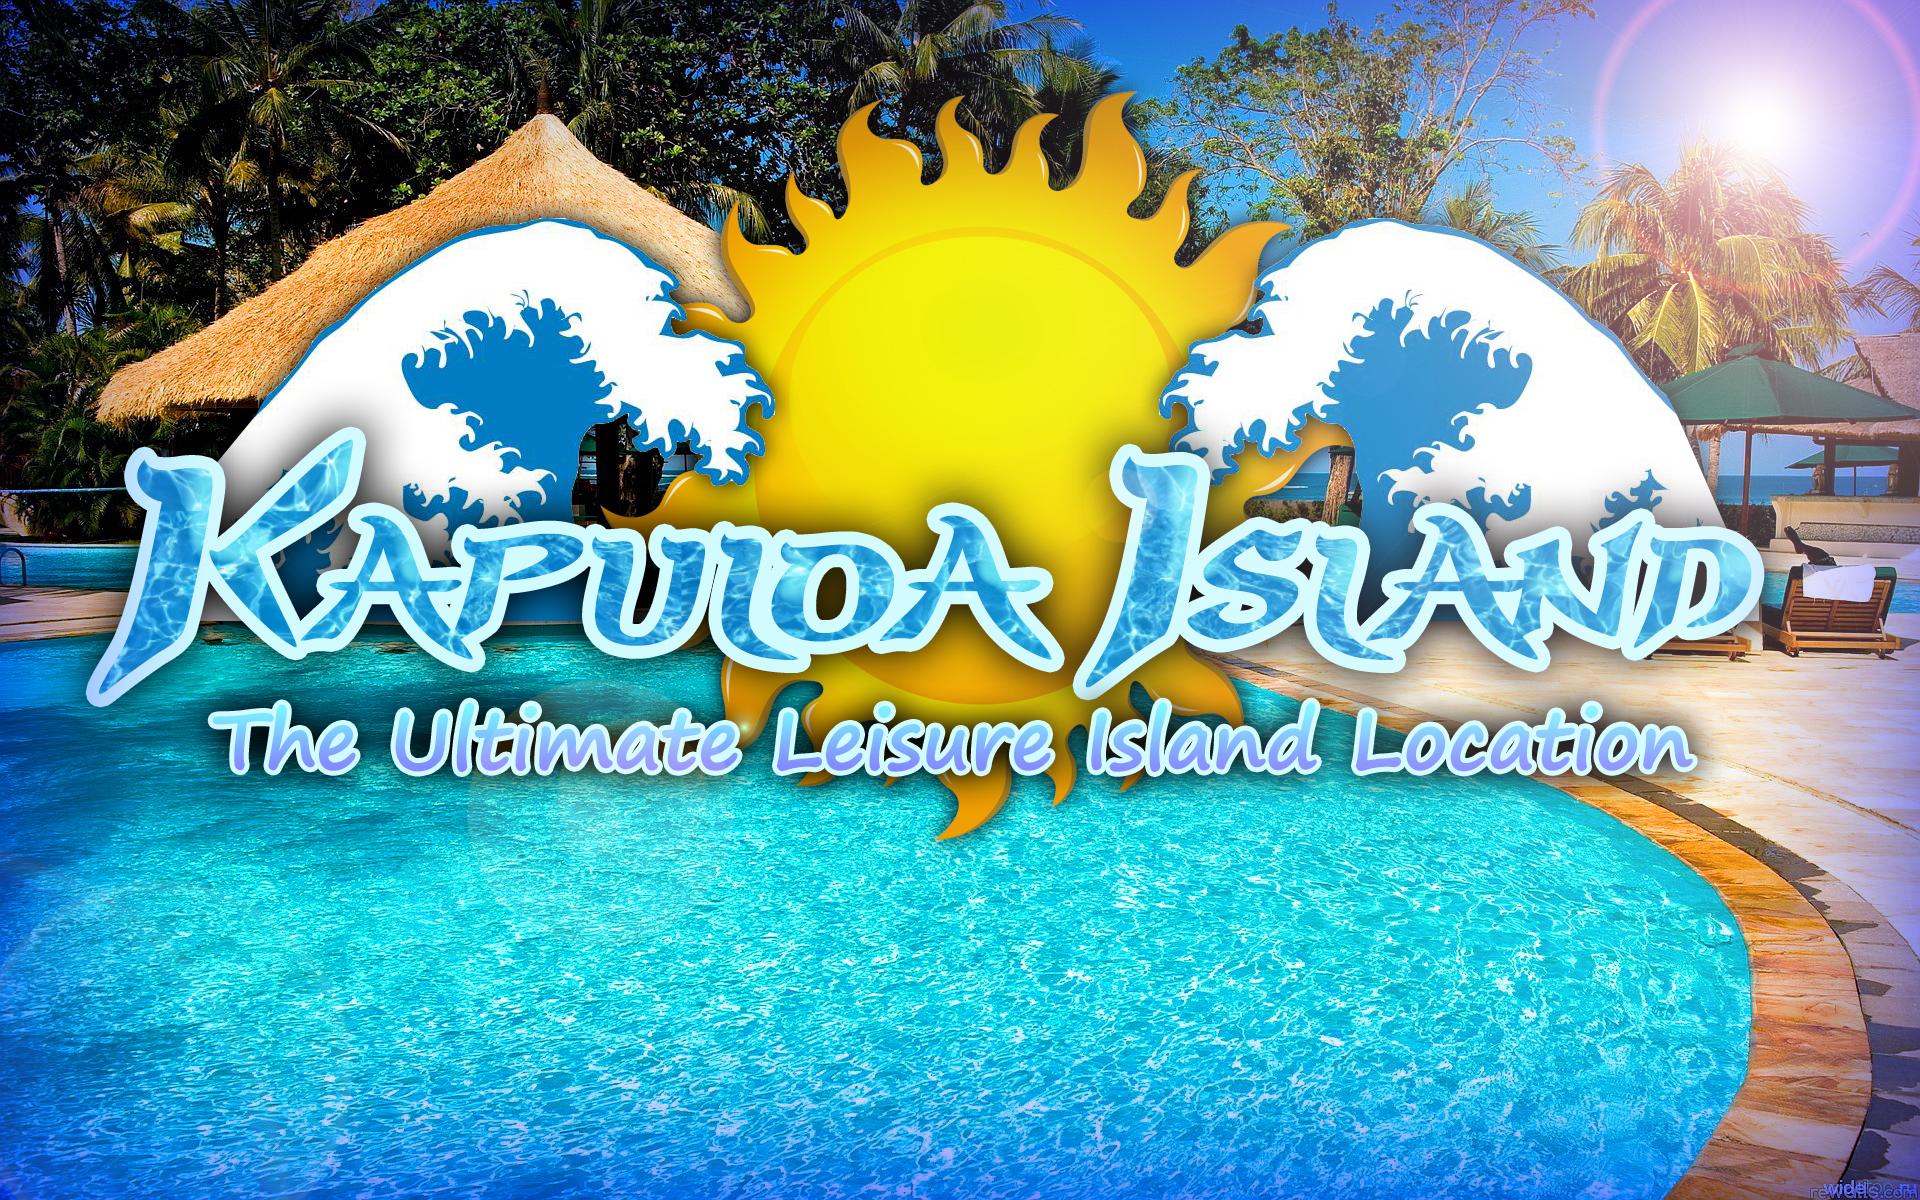 Kapuloa Island